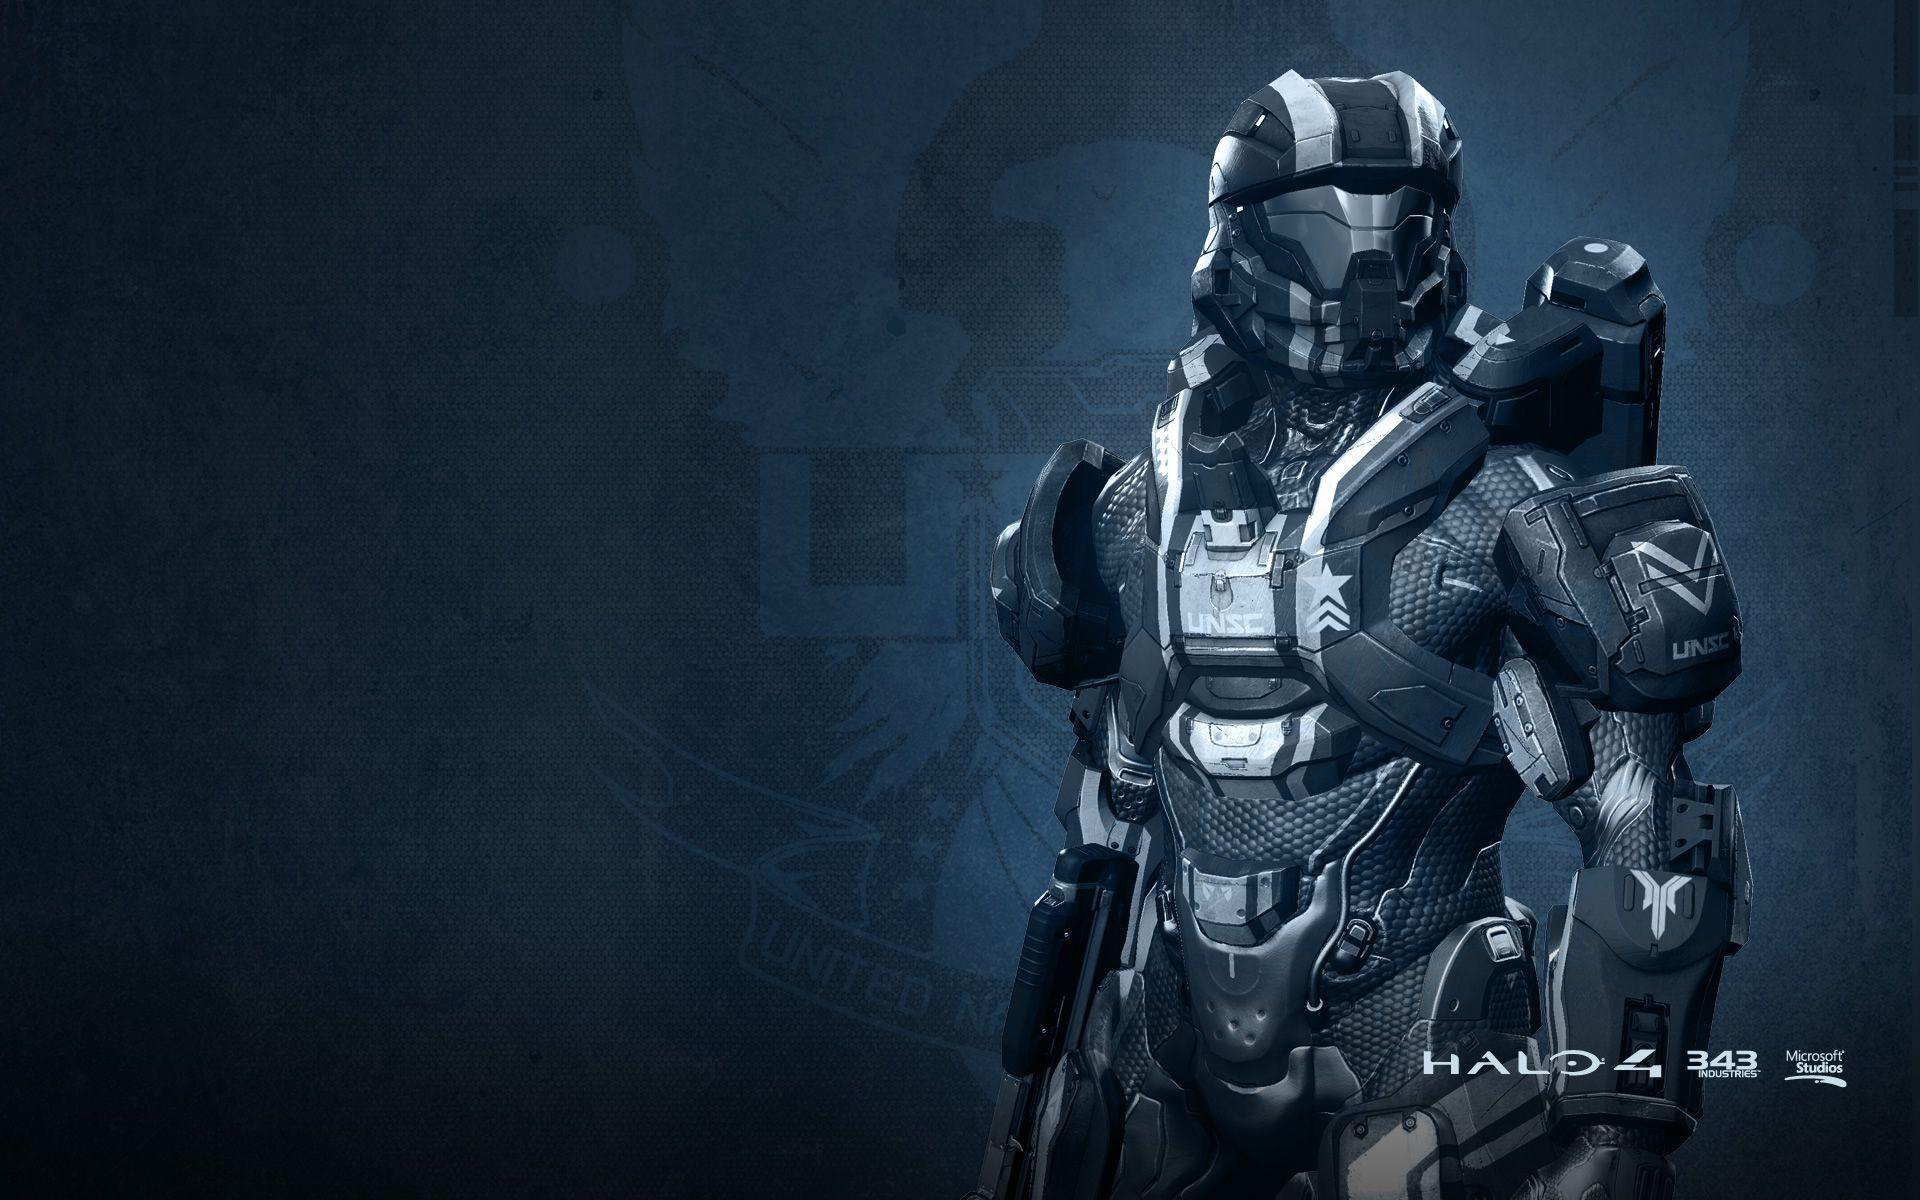 1920x1080 Halo 4 Elite Wallpaper